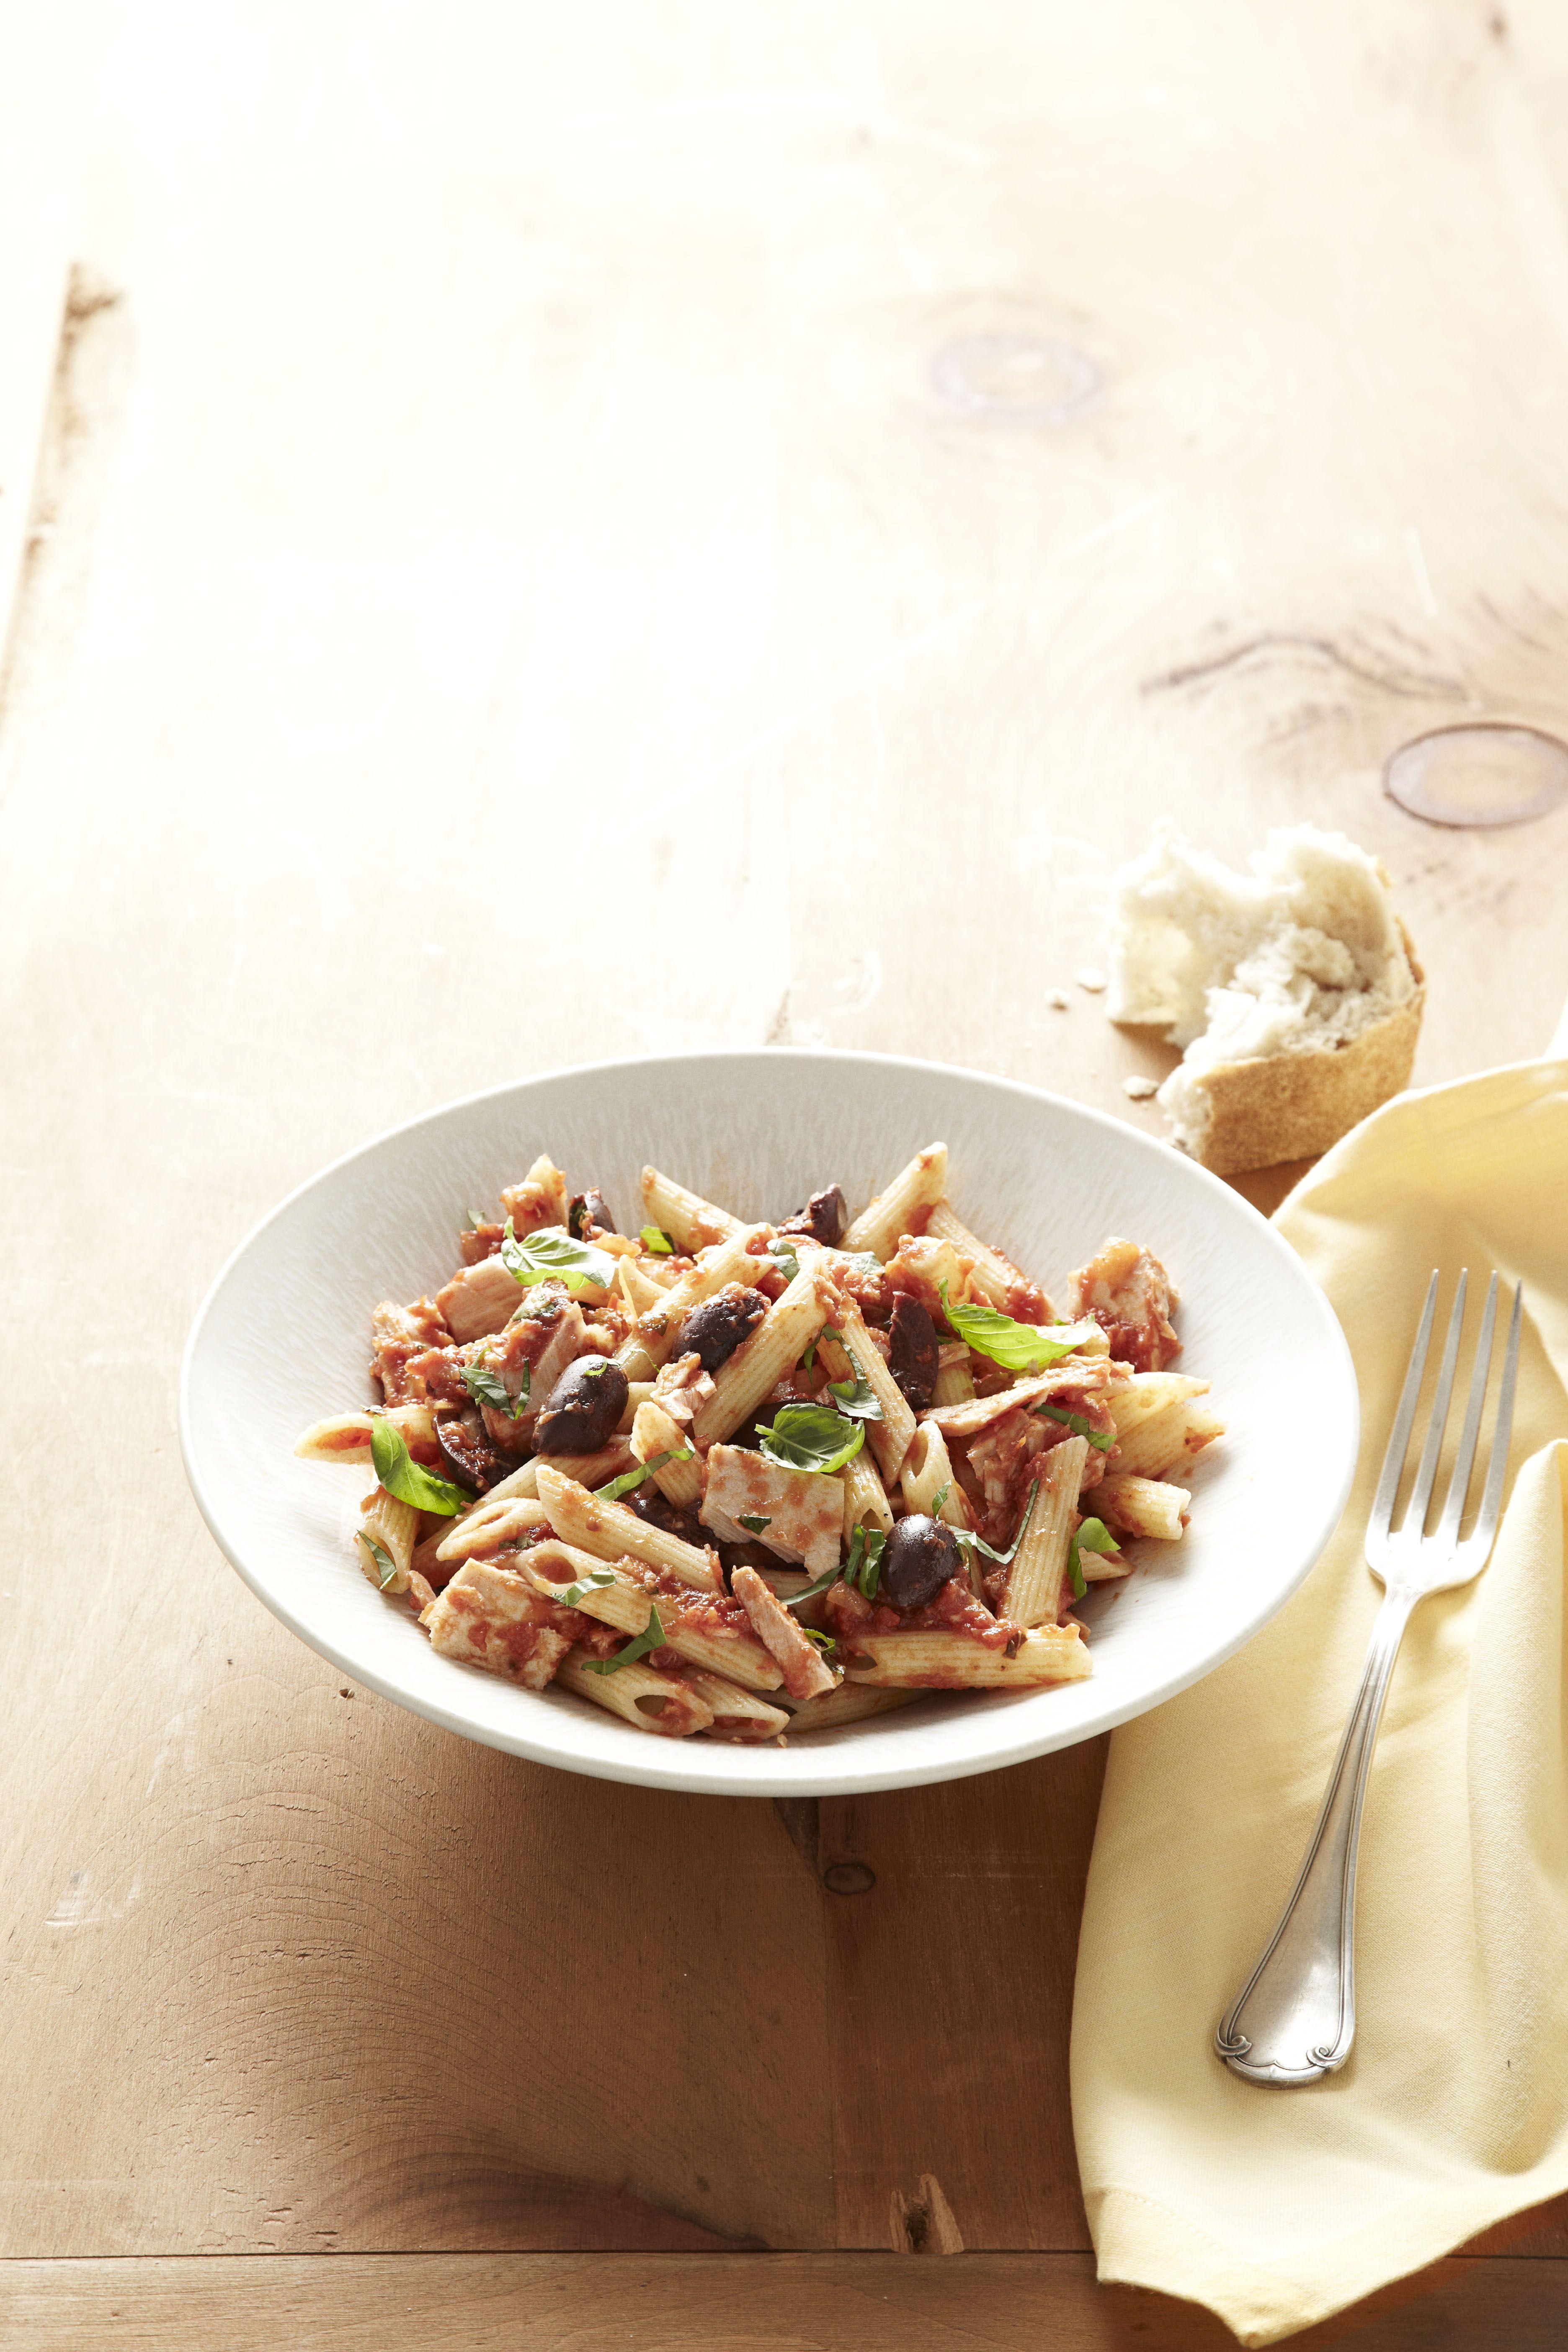 15 super tasty tuna recipes best tuna recipes forumfinder Image collections